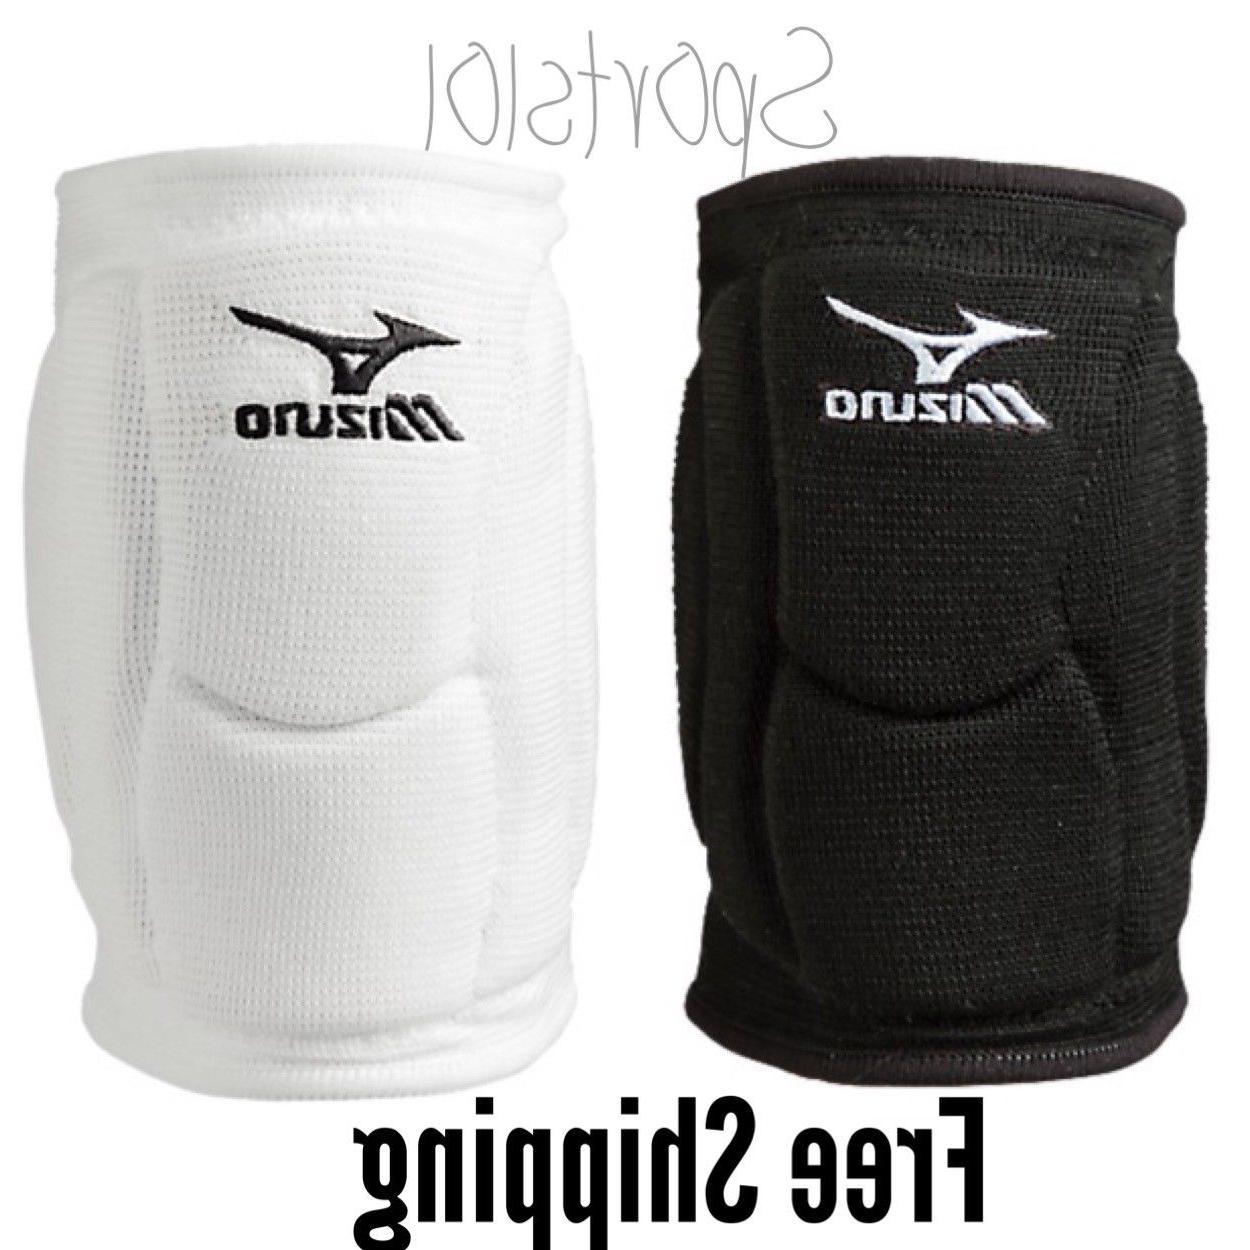 Mizuno Elite 9 SL2 Volleyball Knee Pads 480175 One Pair Whit